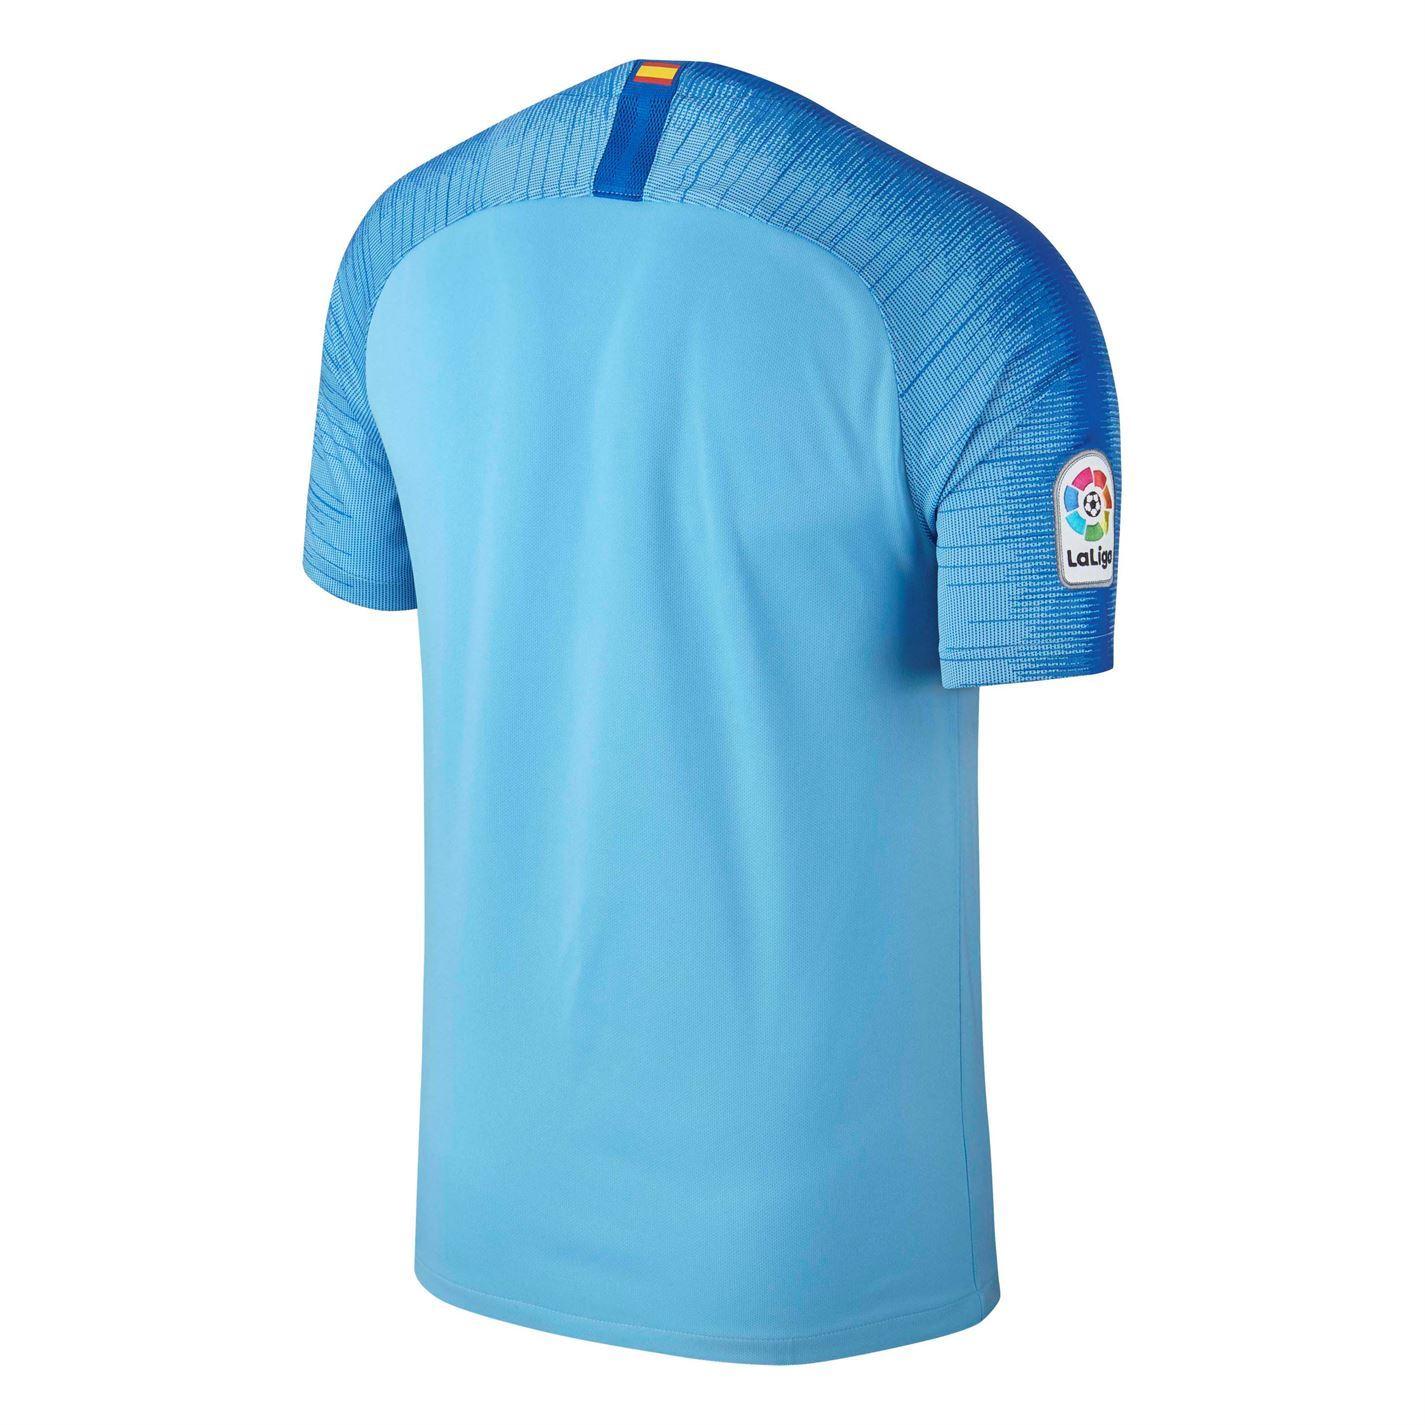 d1166d98b ... Nike Atletico Madrid Away Jersey 2018 2019 Mens Blue Football Soccer  Shirt Top ...